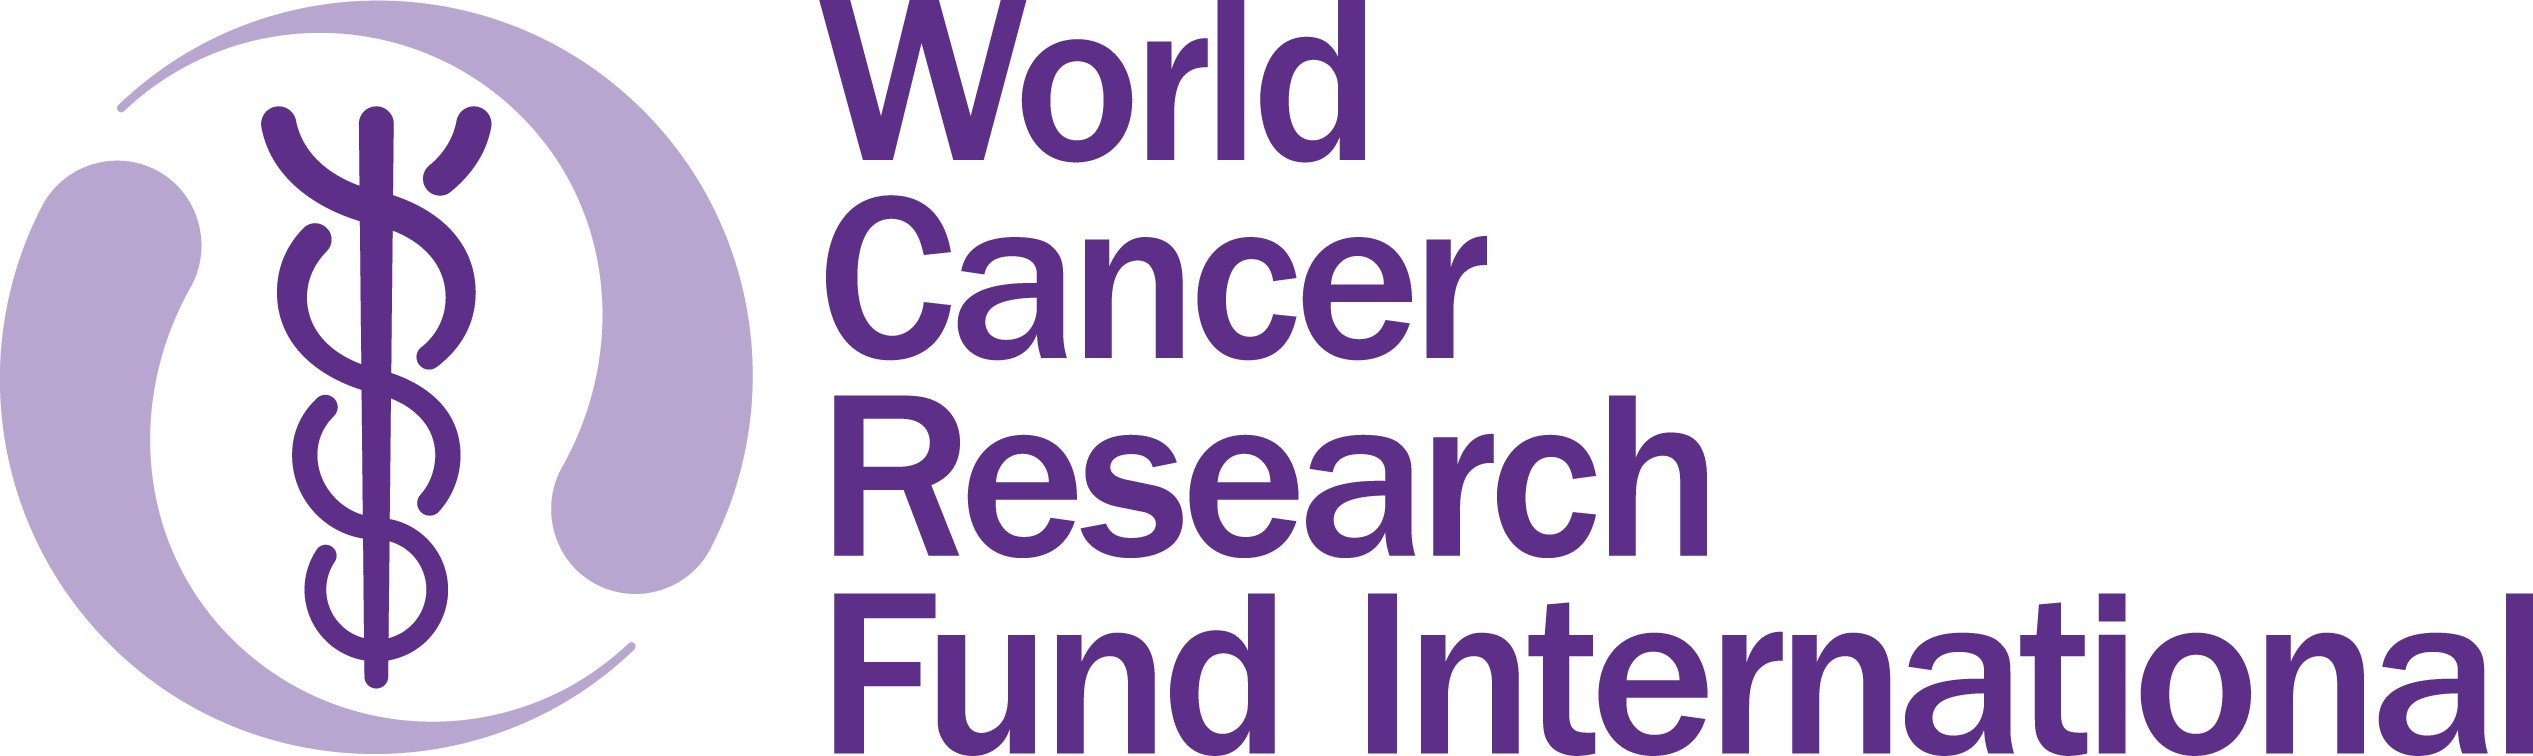 World Cancer Research Fund International